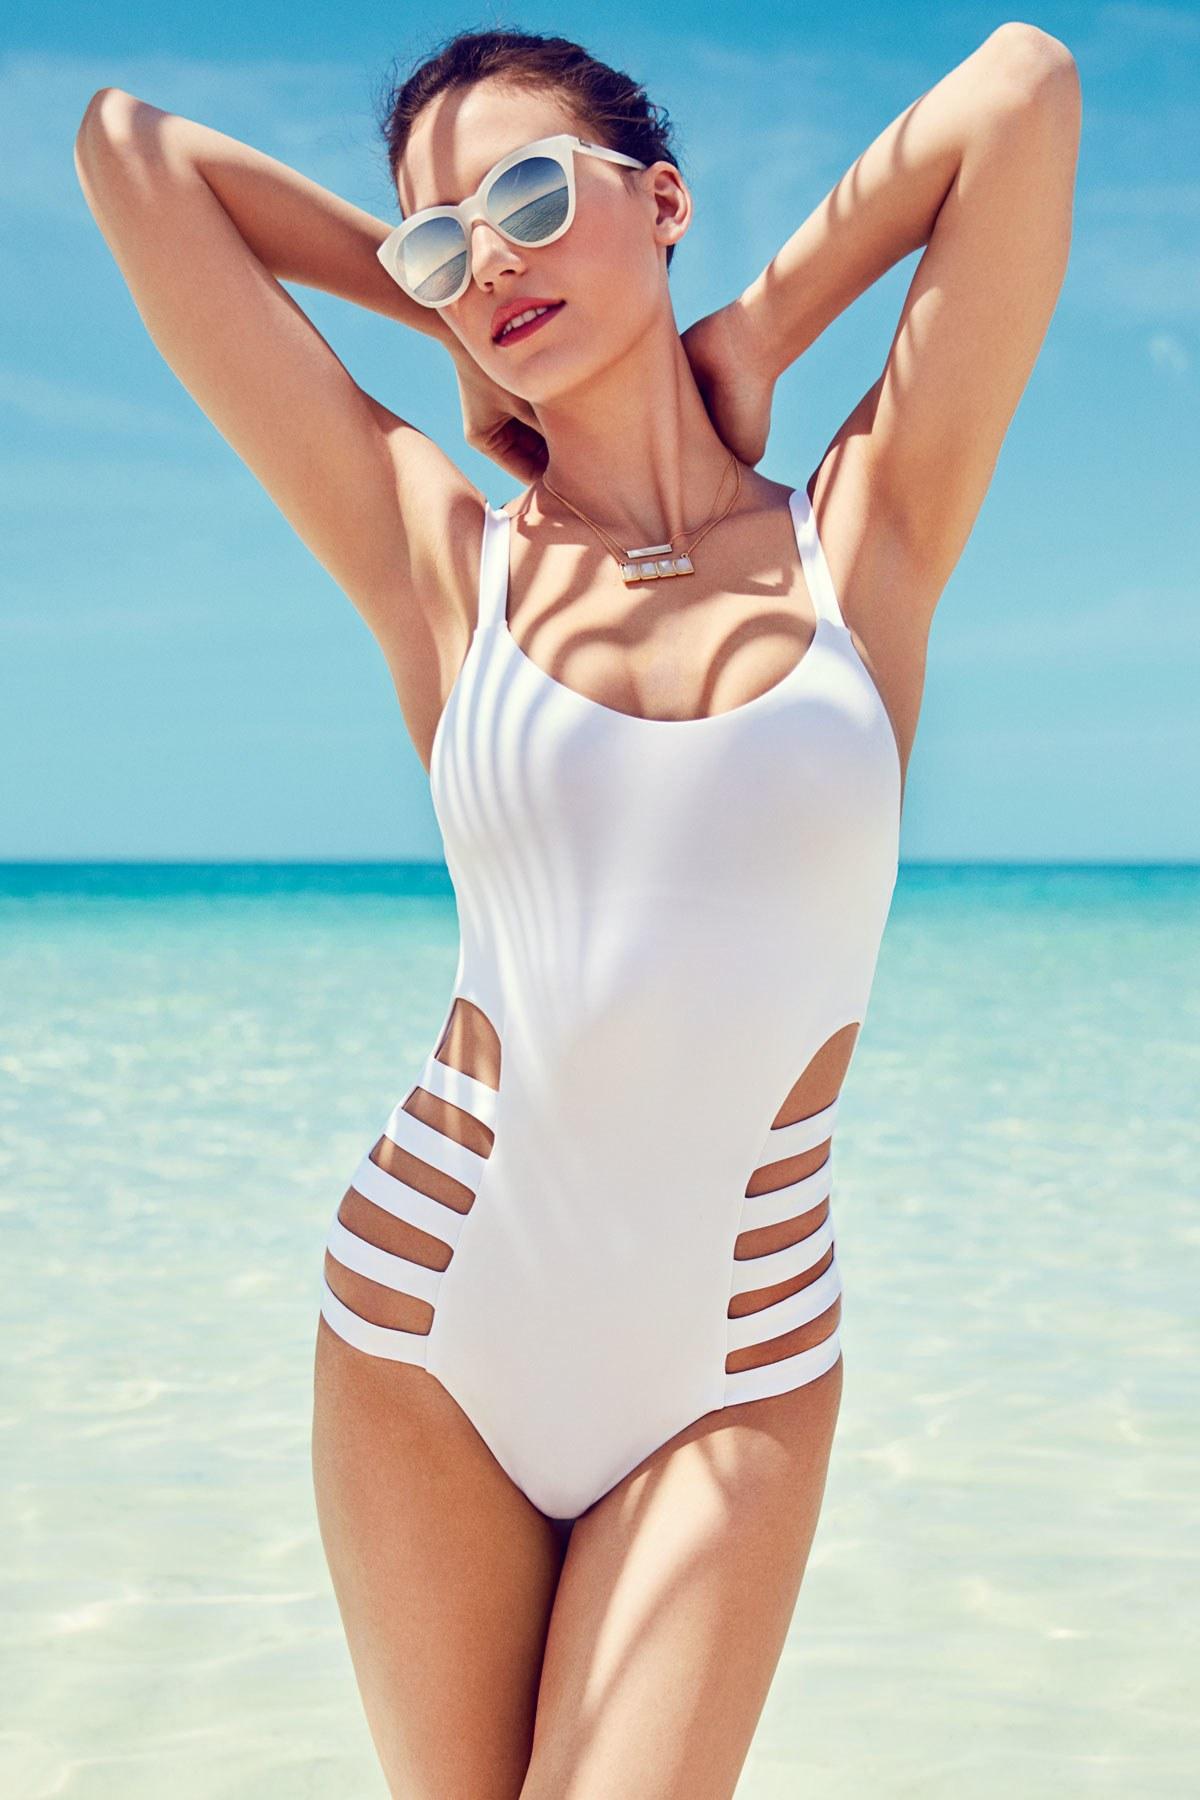 Benefits Of Having White SwimSuit